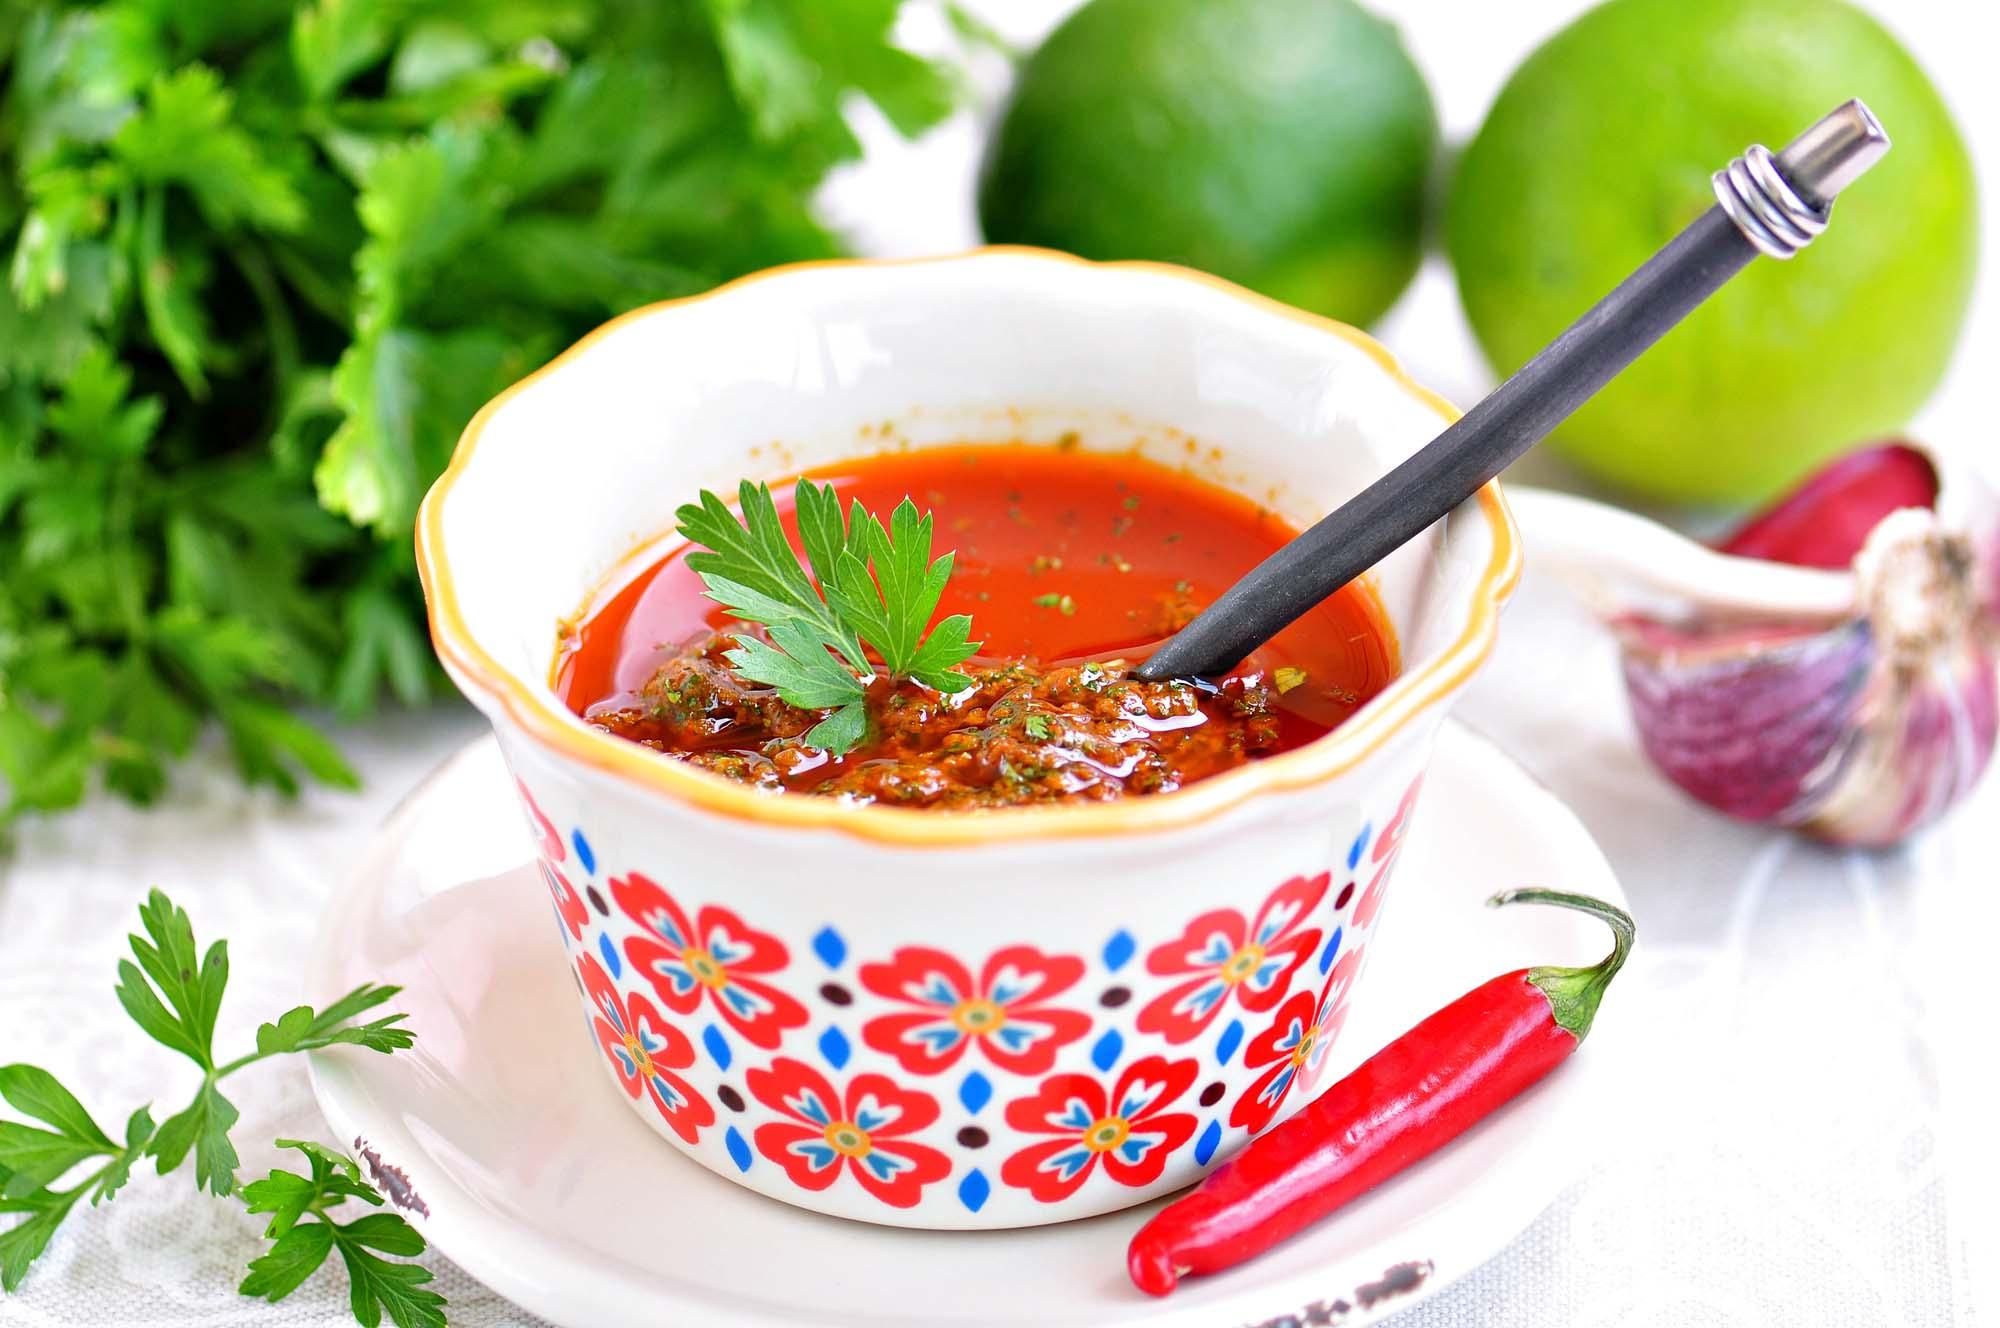 Chili-lime marinade